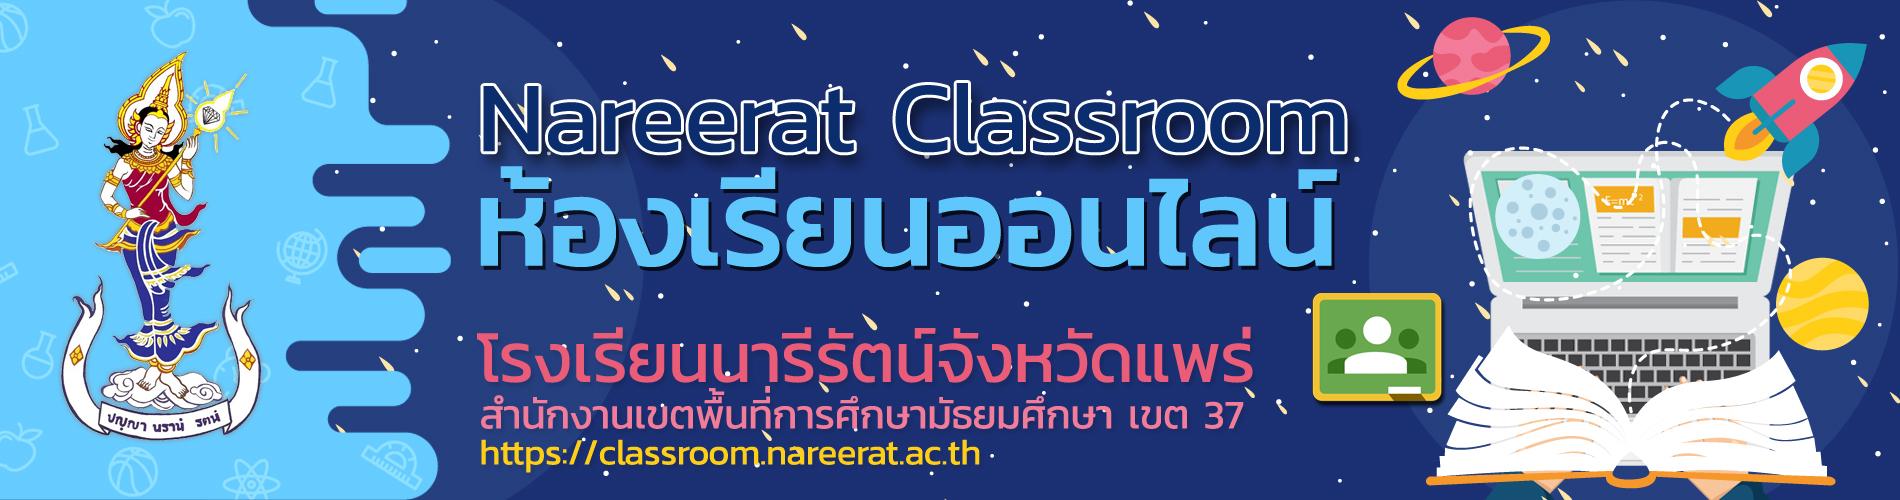 NR Classroom